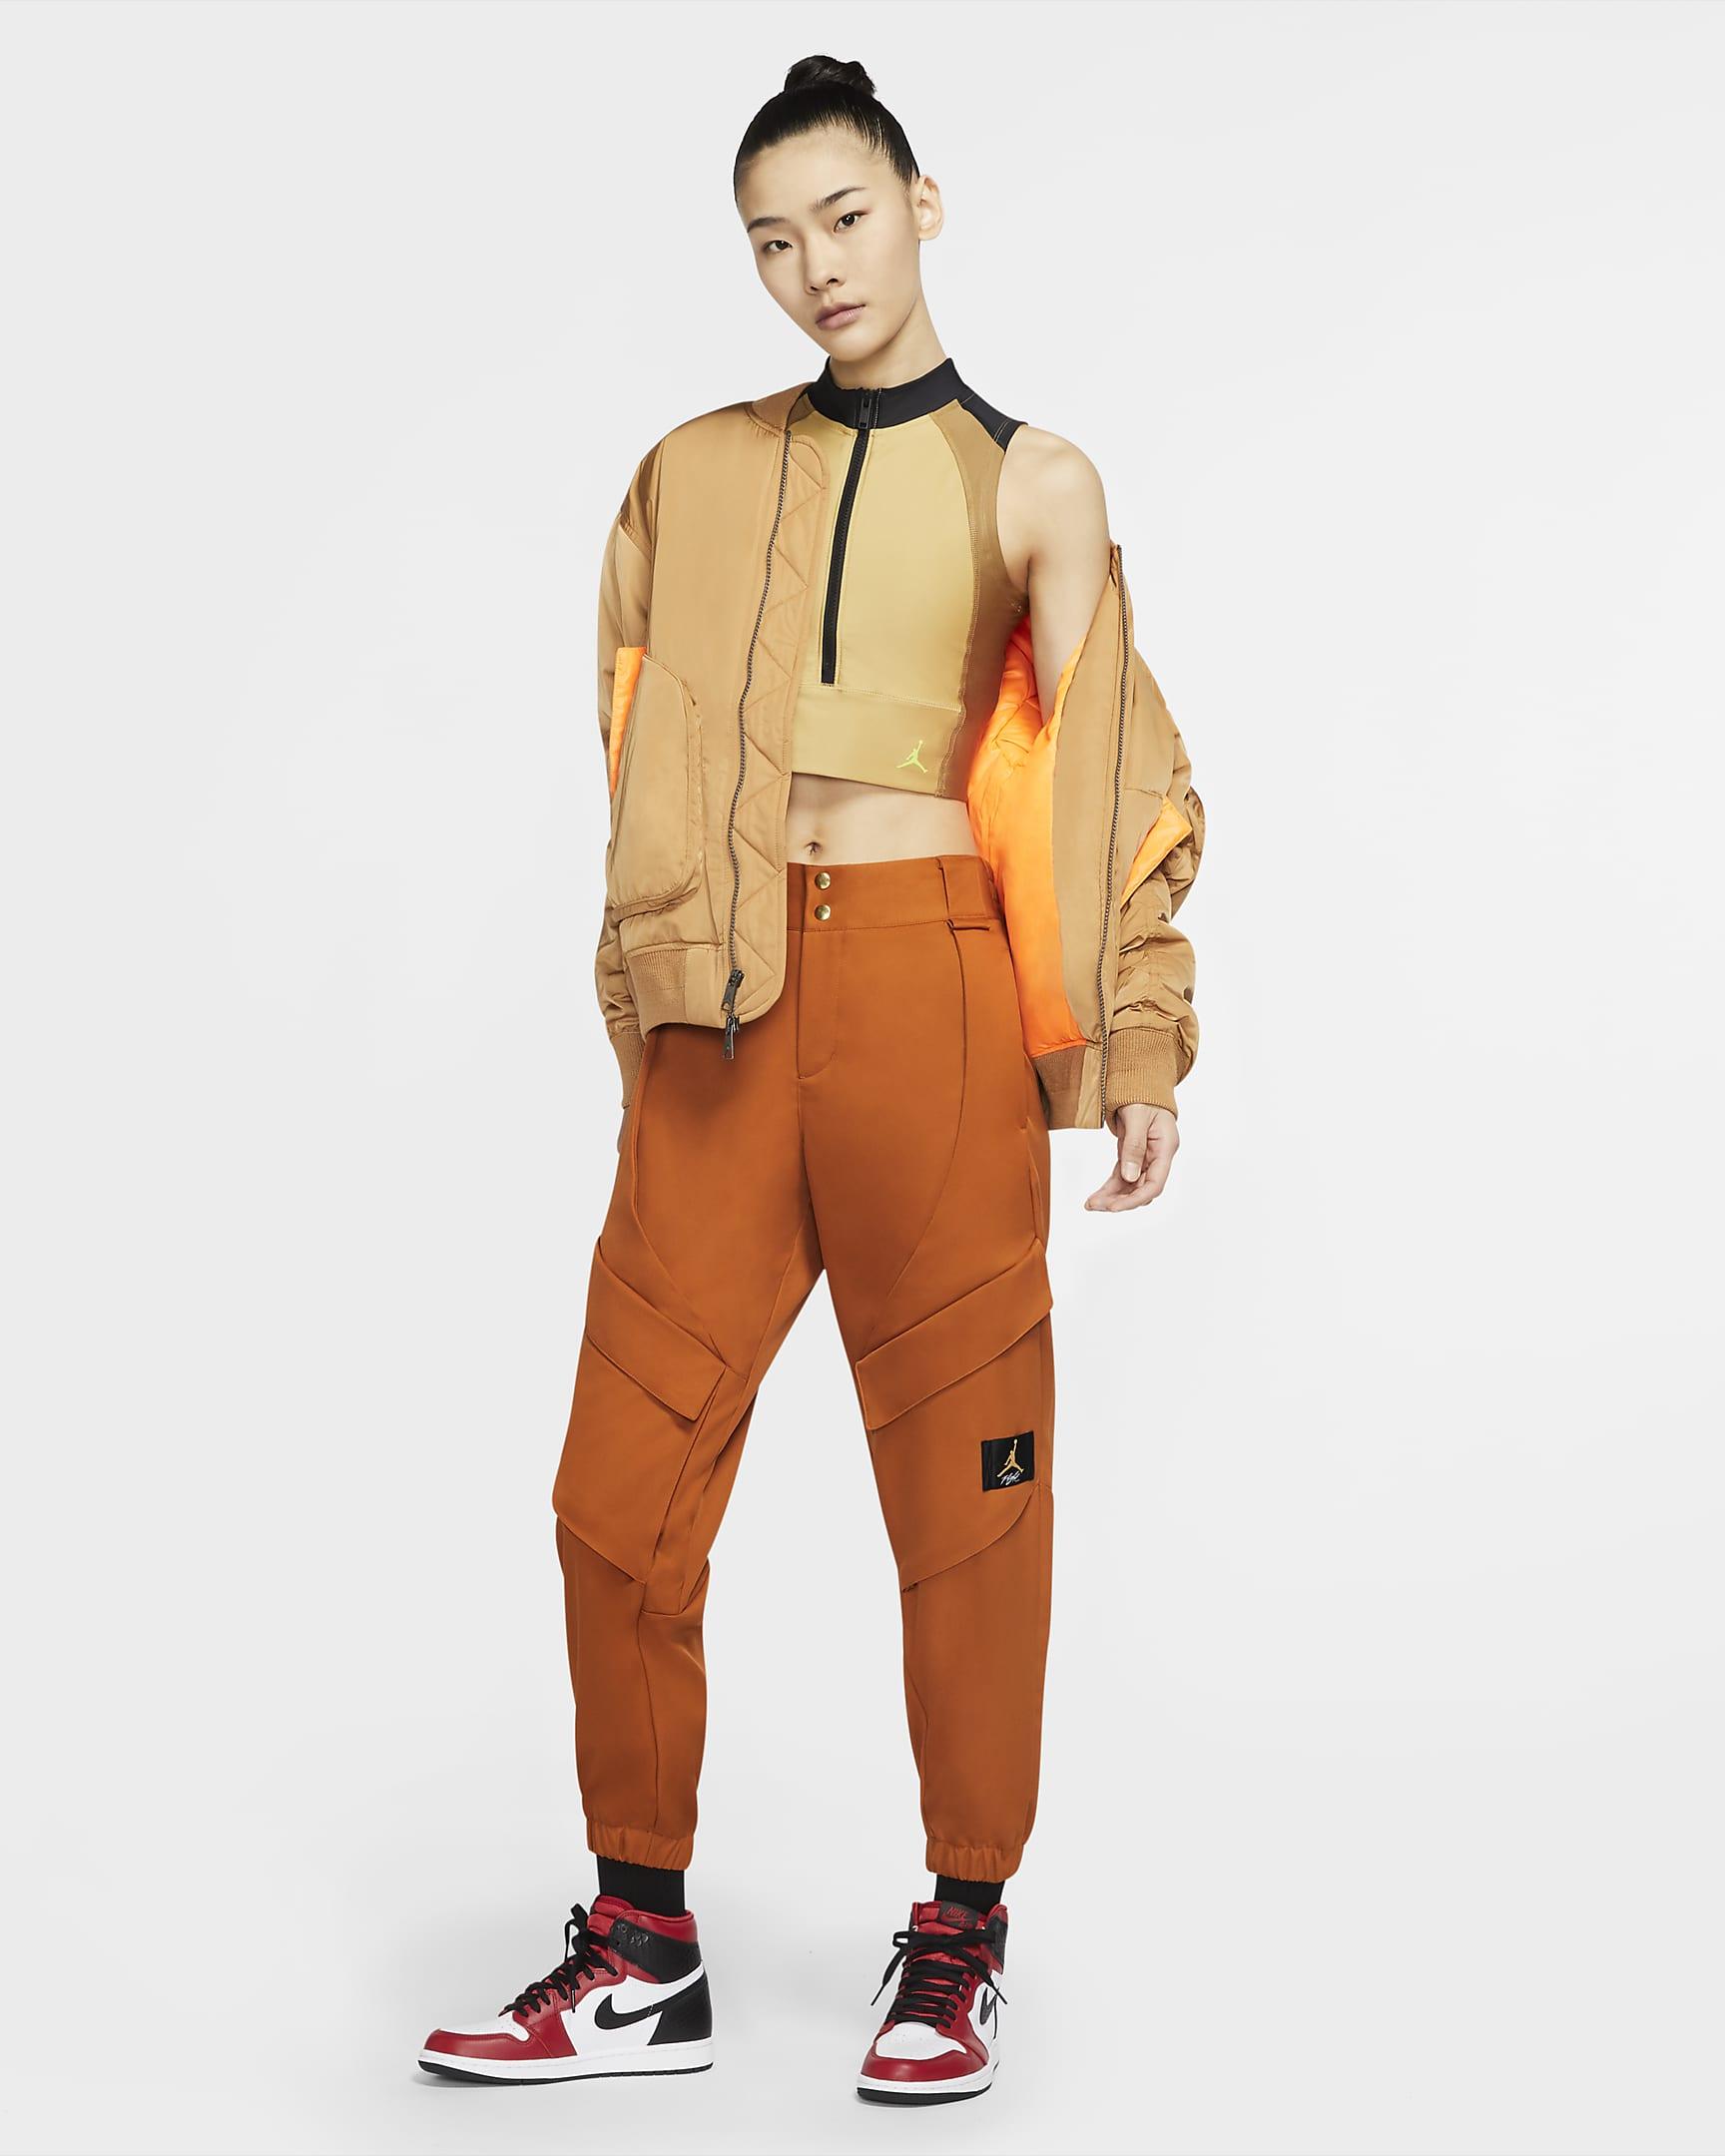 jordan-essentials-womens-utility-pants-nRqDZ8-2